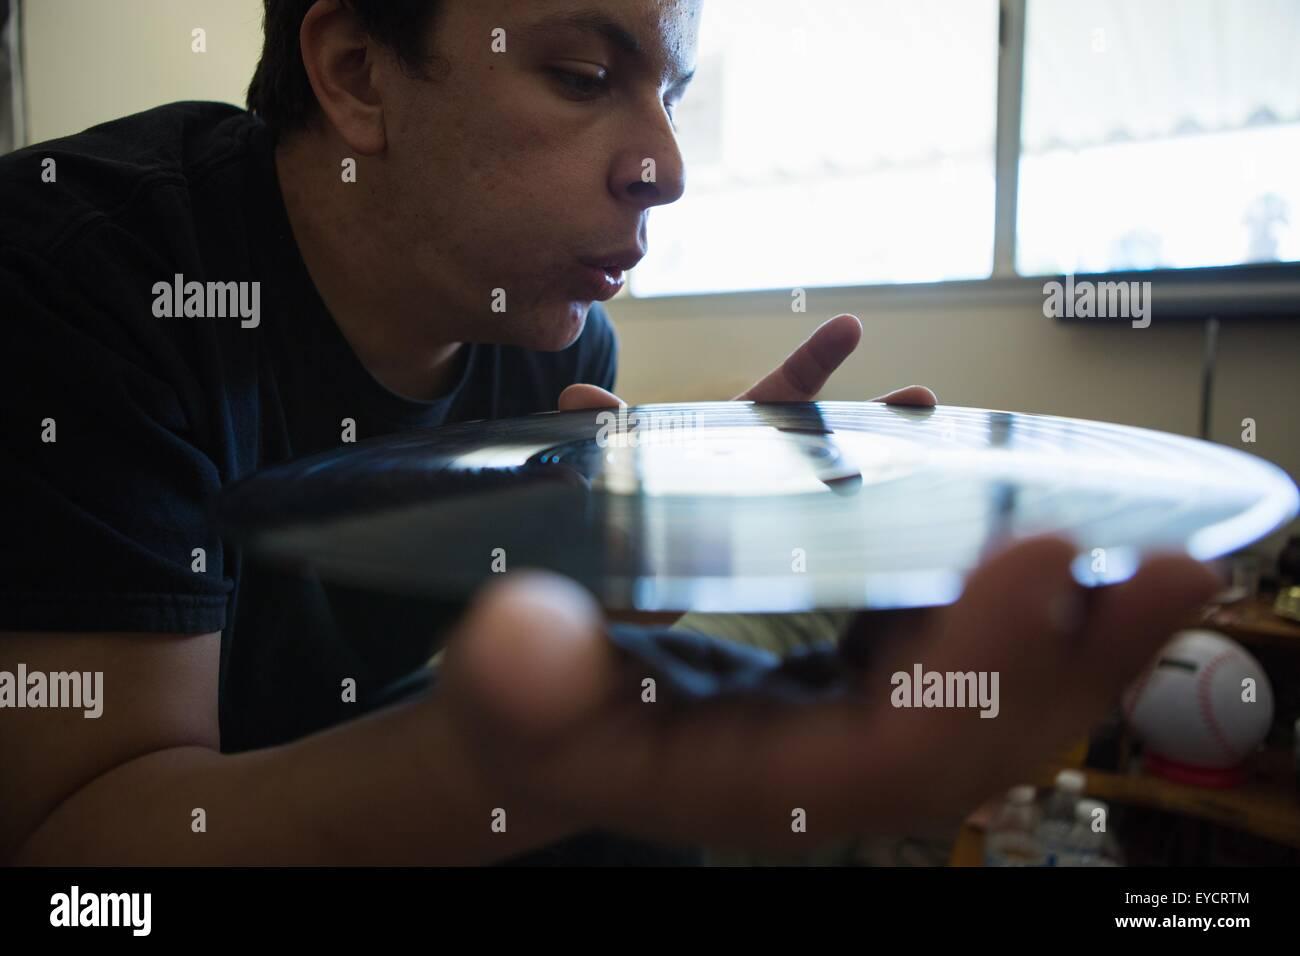 Nahaufnahme von junger Mann bläst Oberfläche Vinyl-Schallplatte Stockbild